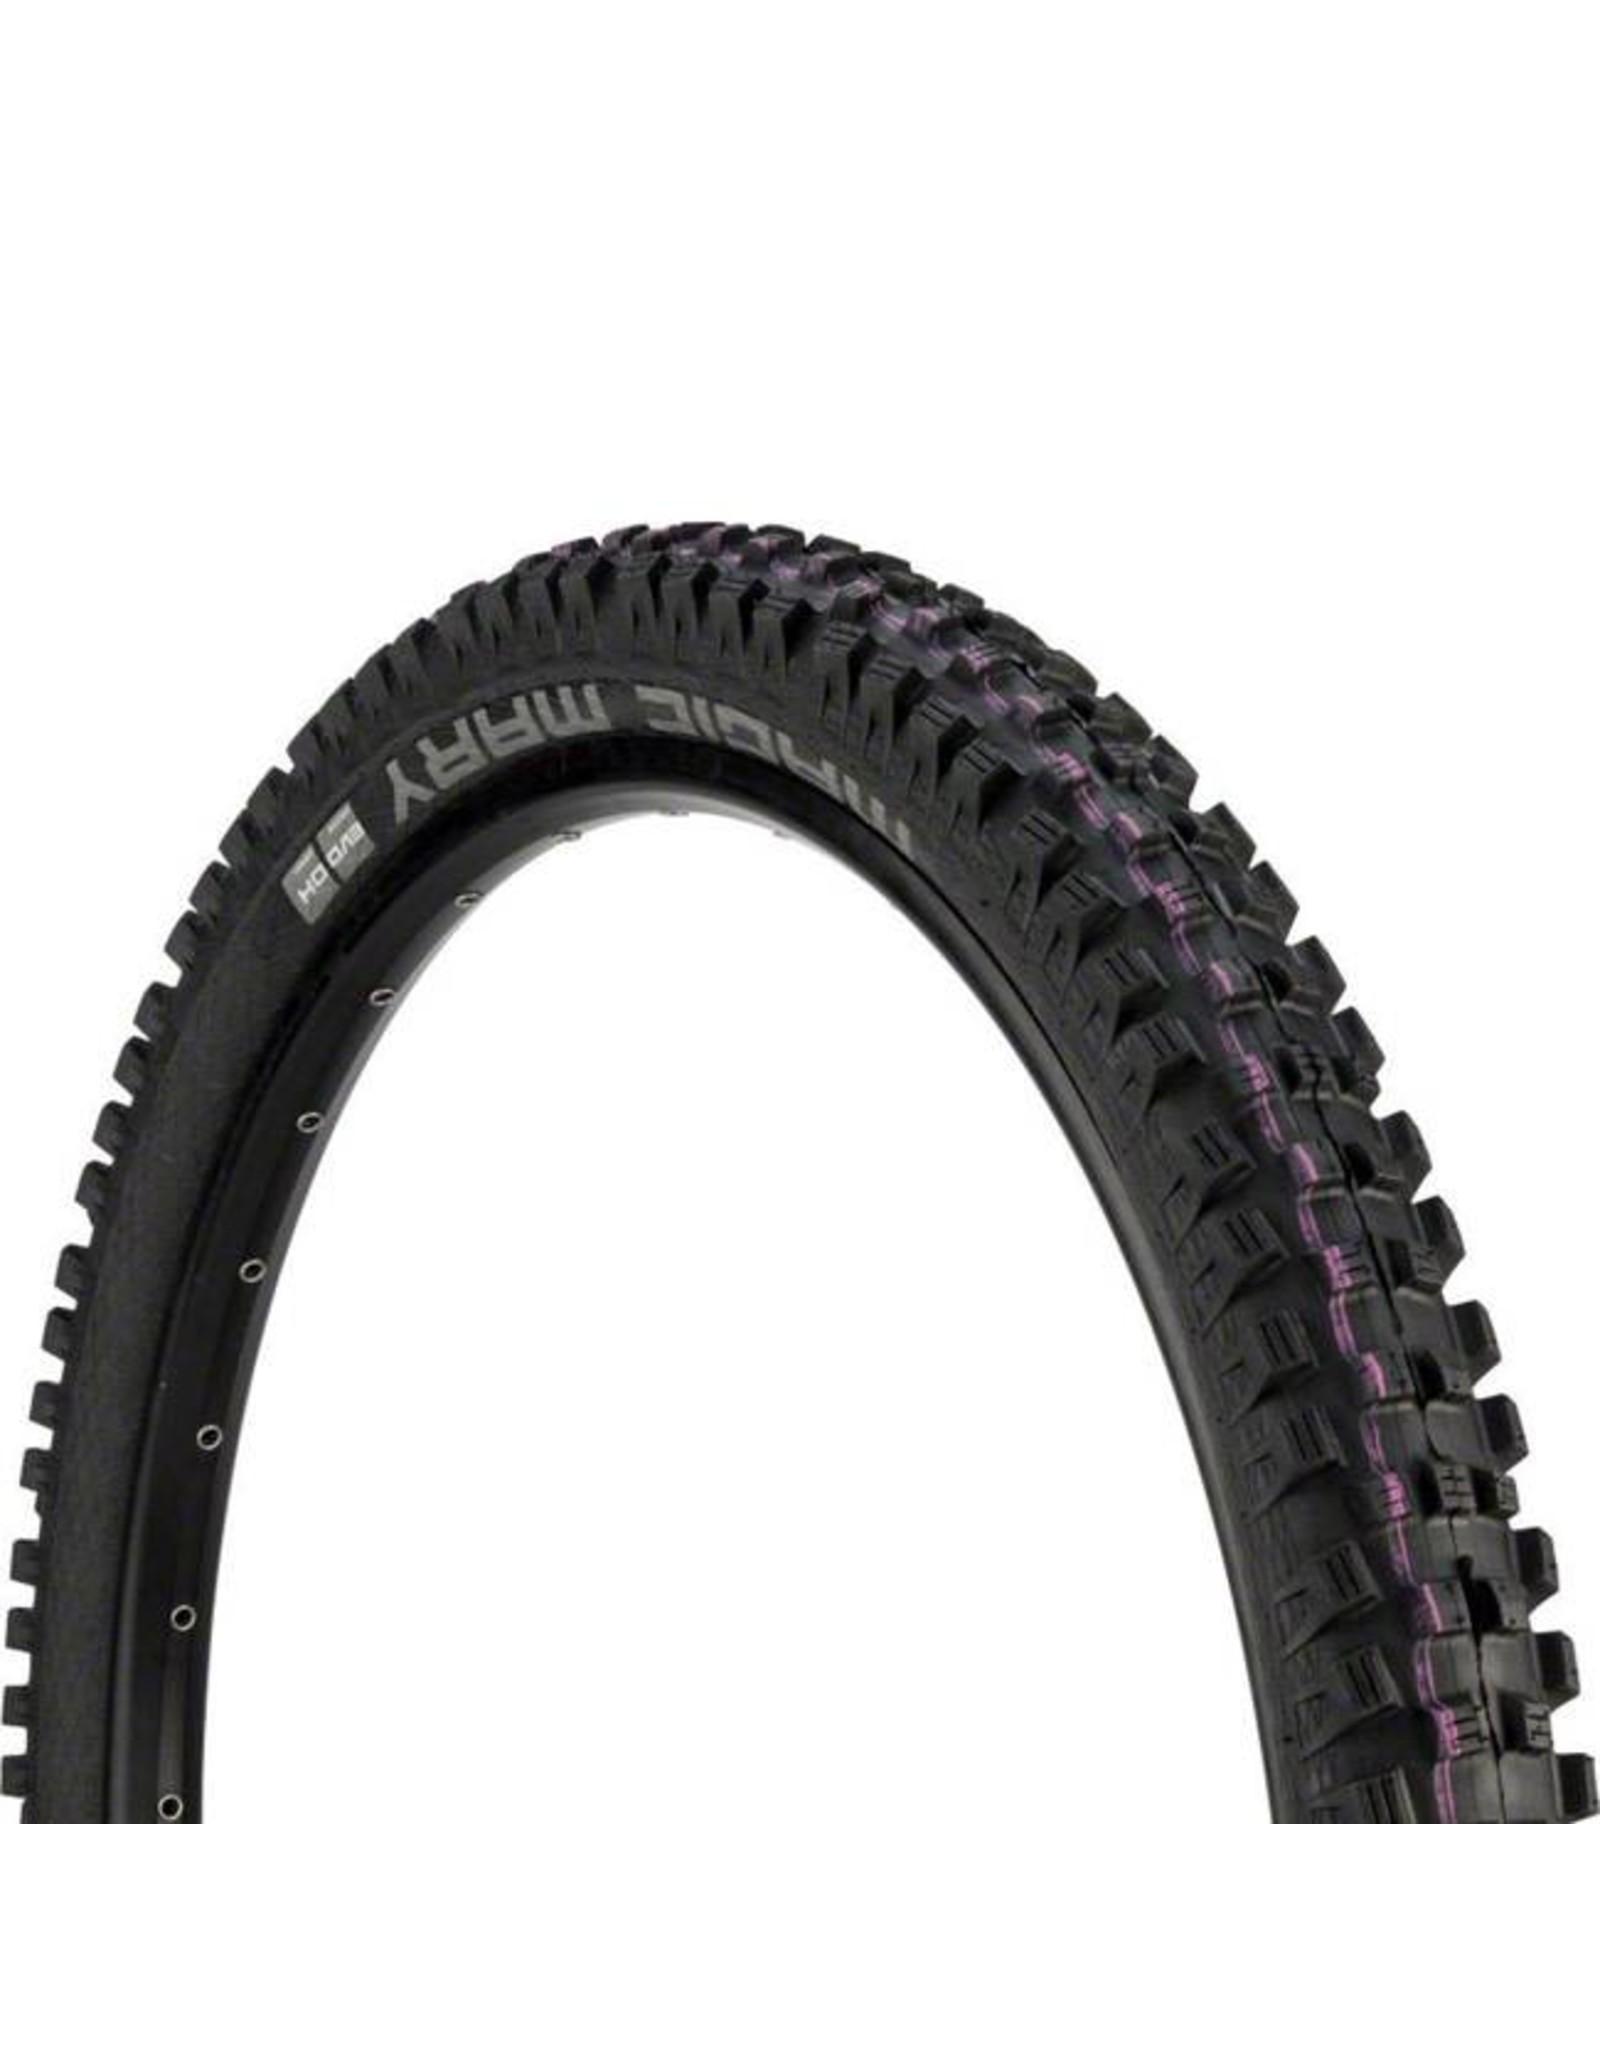 "Schwalbe Schwalbe Magic Mary Tire: 27.5 x 2.35"", Wire Bead, Evolution Line, Addix Ultra Soft Compound, Downhill, Black"